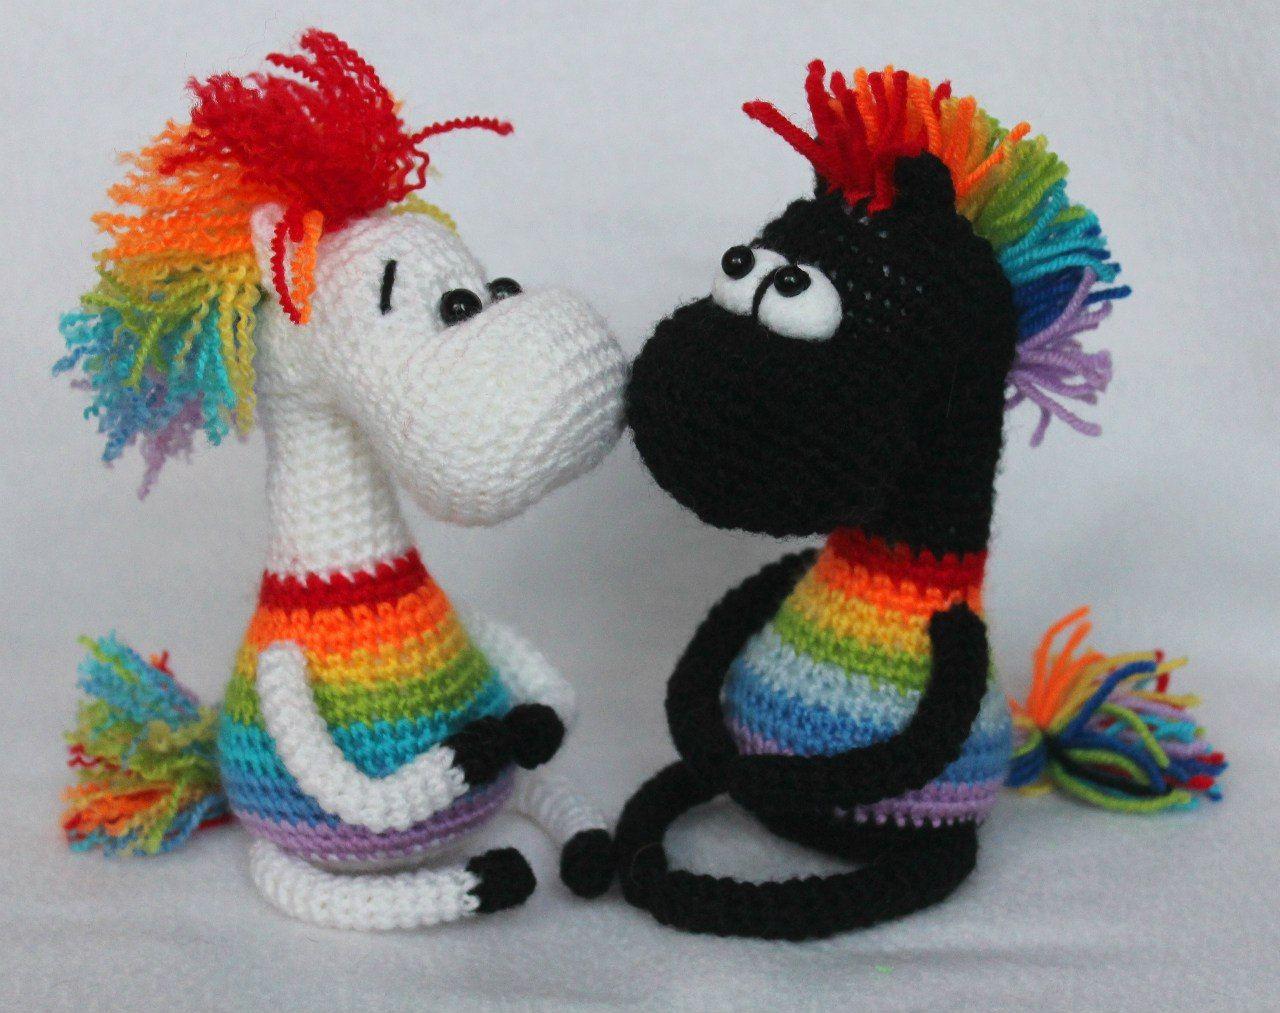 caballo del arco iris amigurumi libre patrón | ternuritas ...